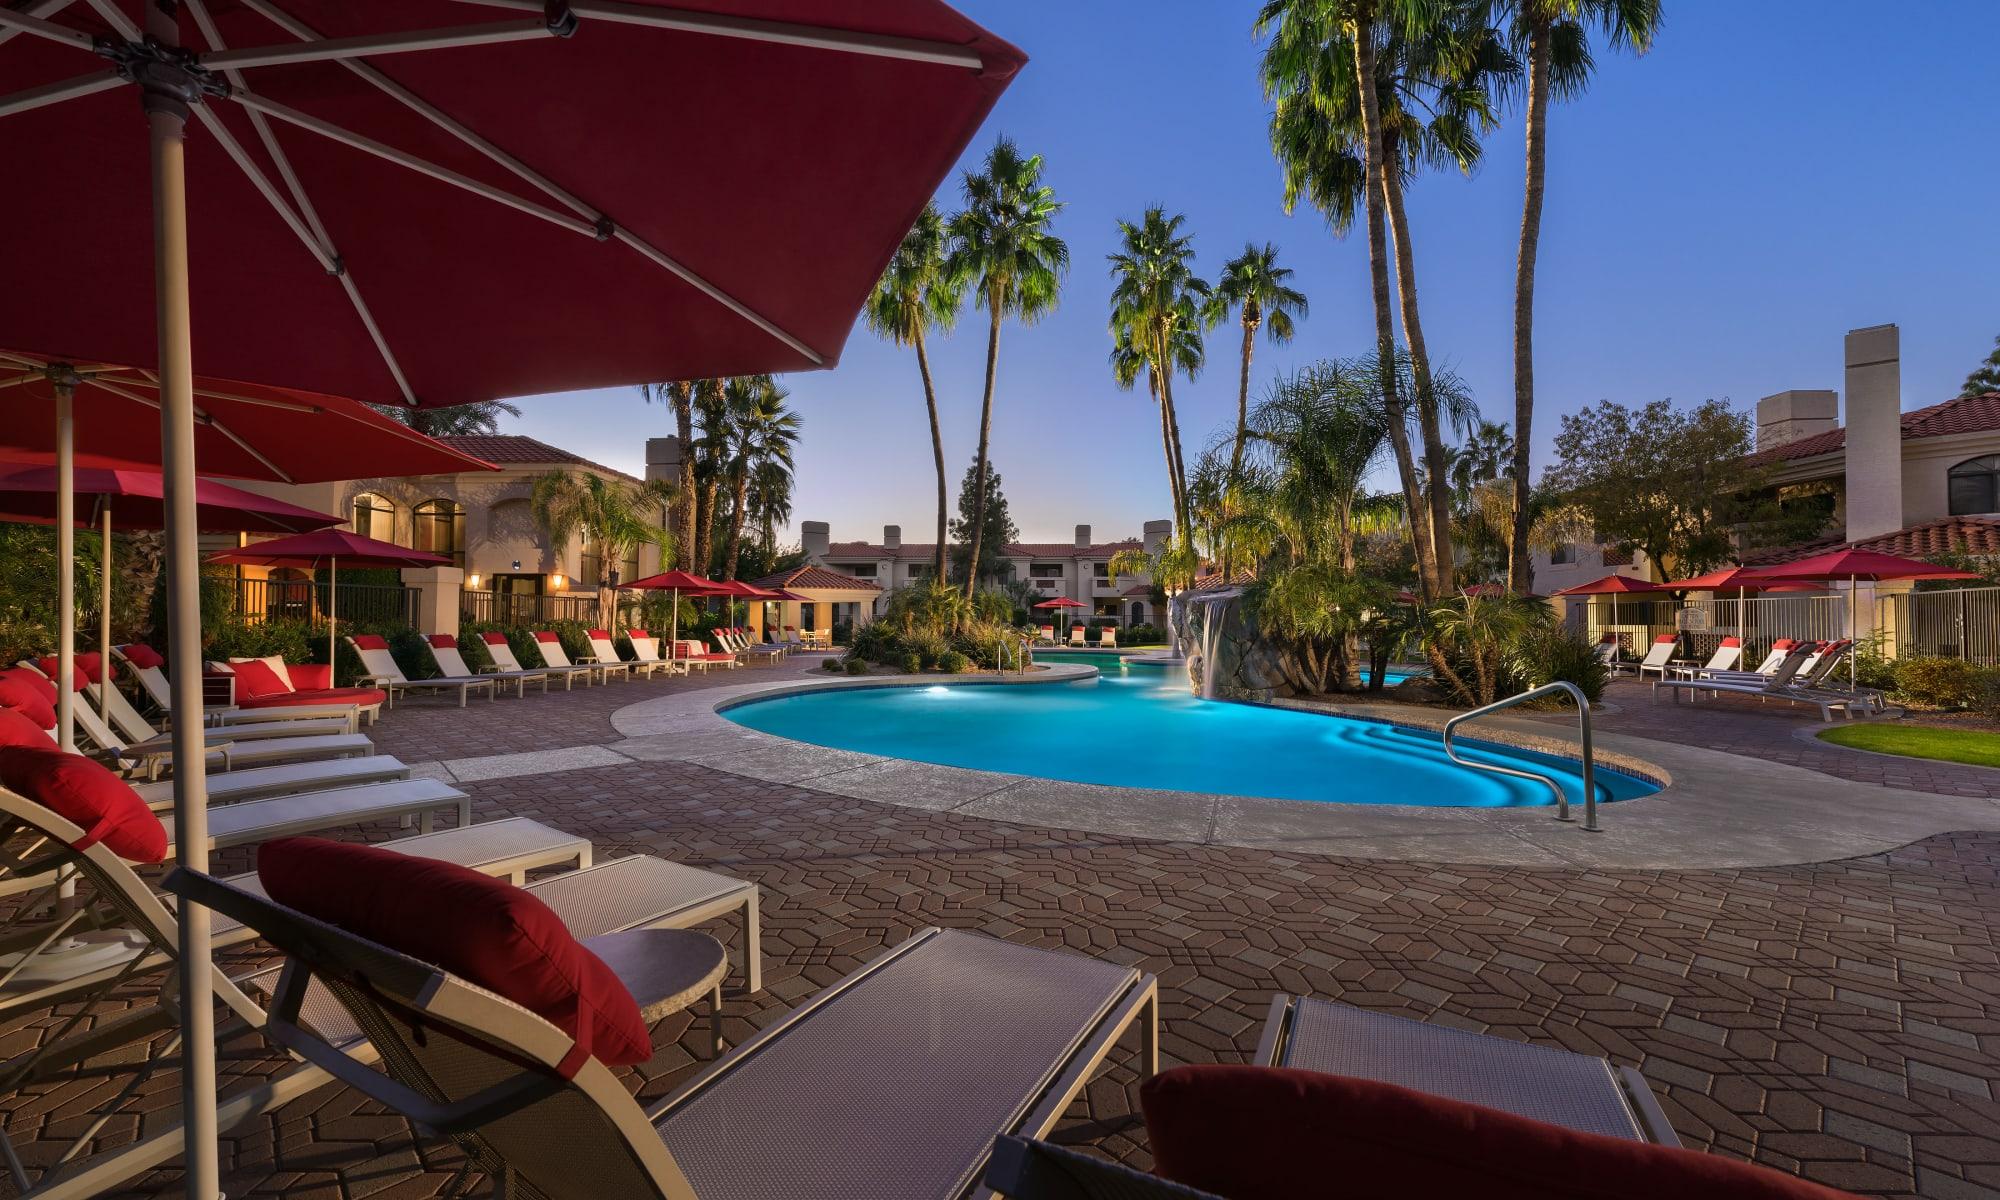 Apartments at San Palmilla in Tempe, Arizona